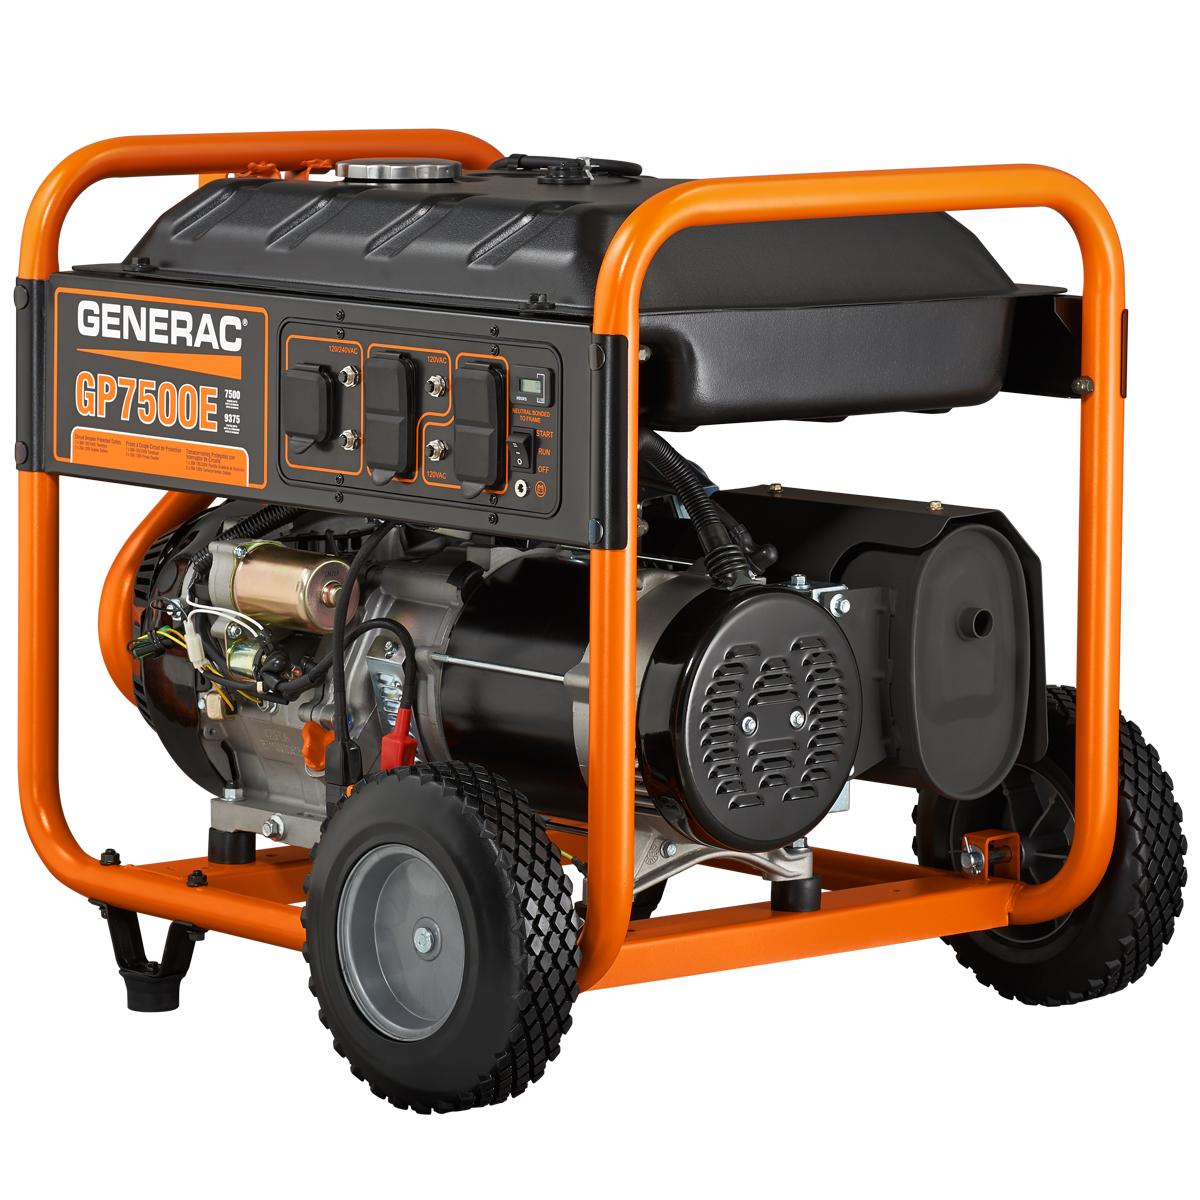 hight resolution of generac 5943 7500 watt electric start portable generator 49 state csa walmart com